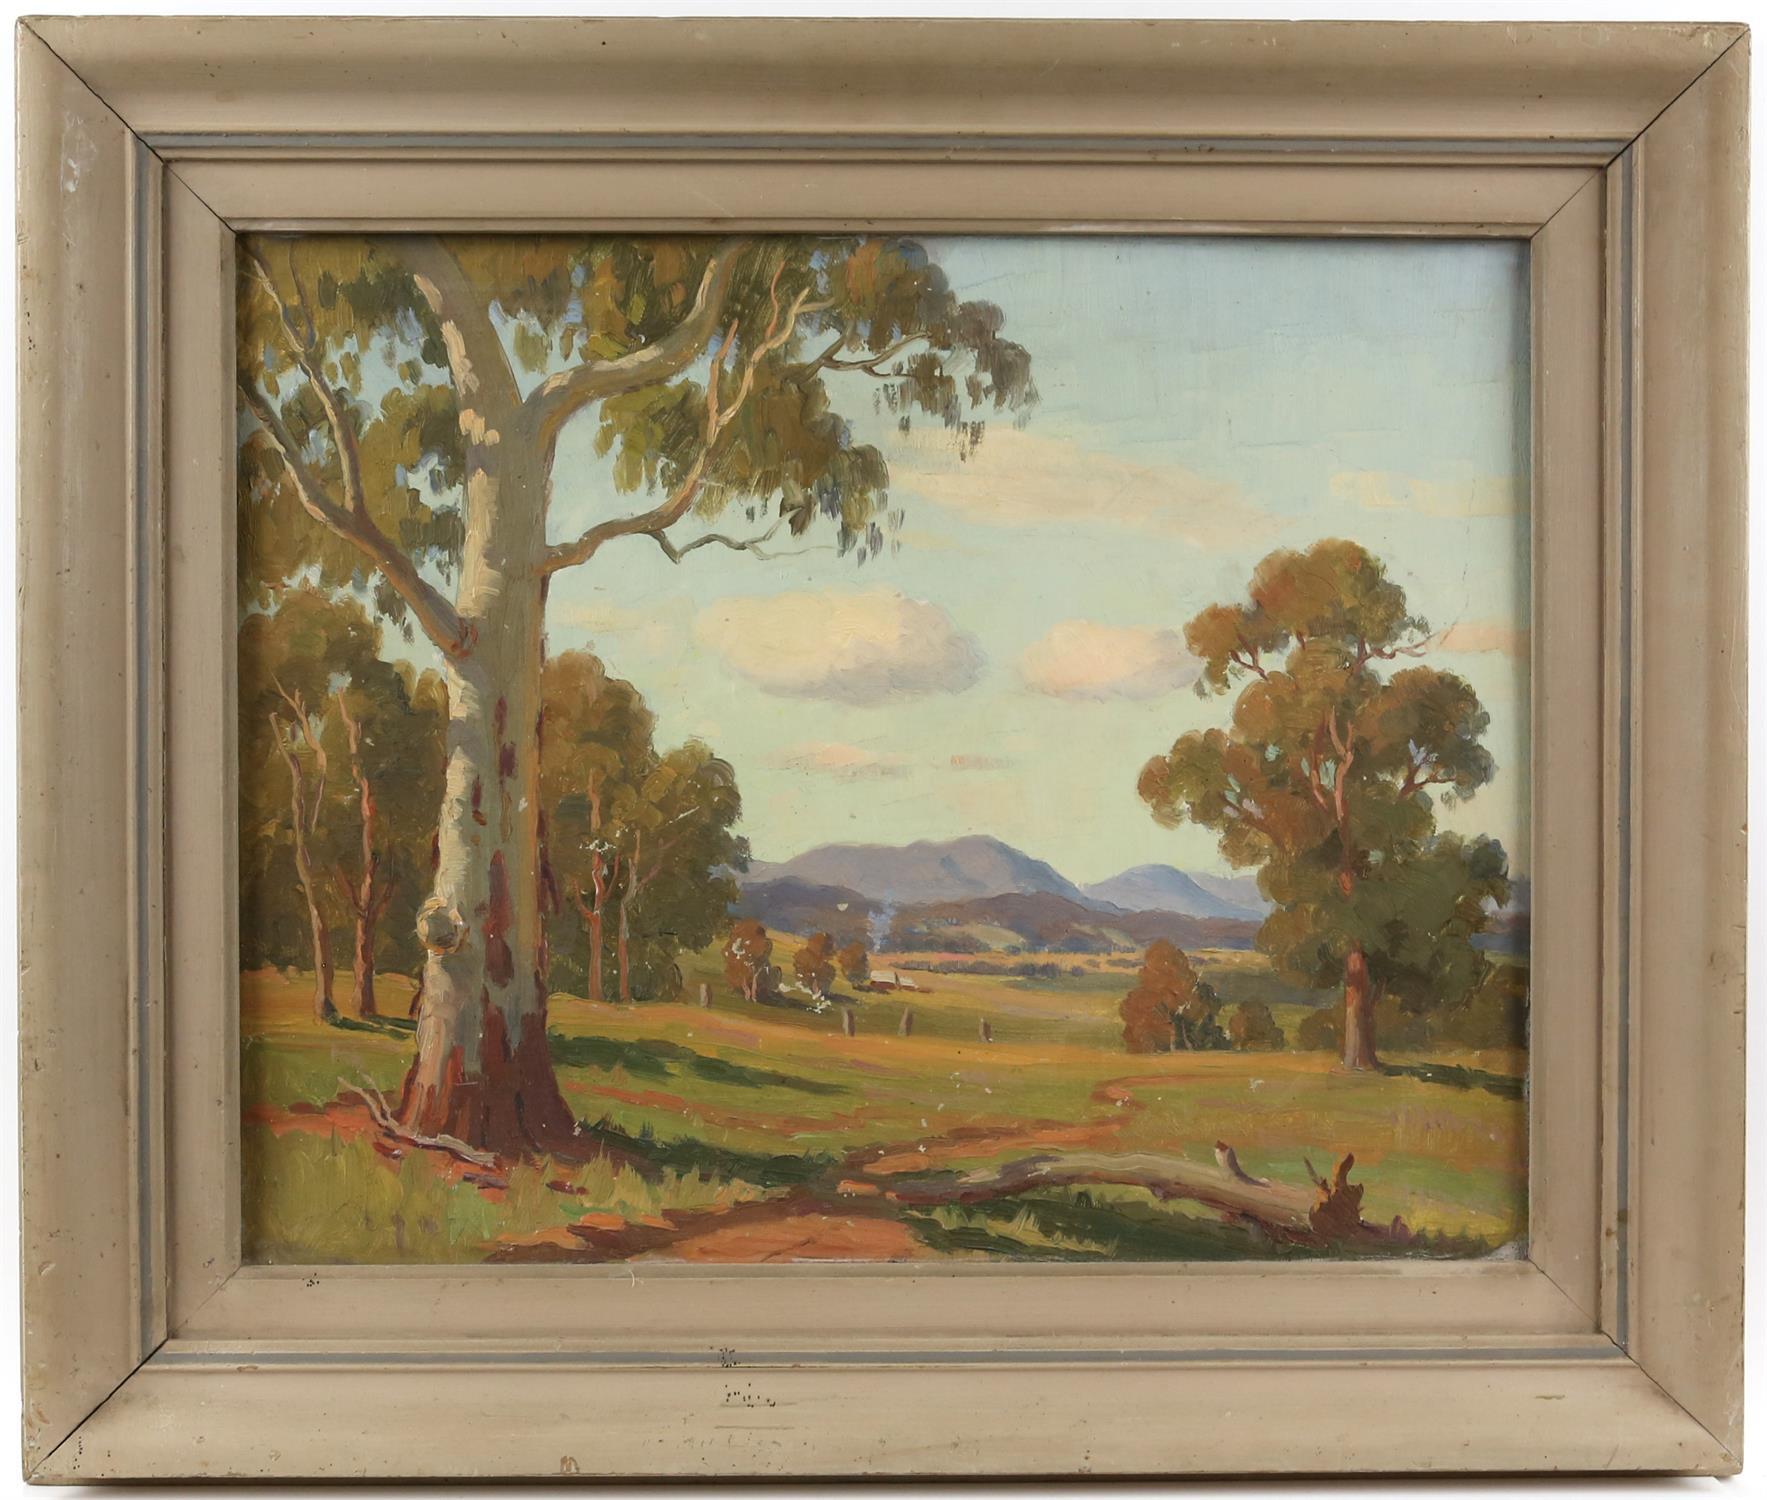 Australian School, landscape with gum trees, oil on canvas-board, 41cm x 51cm - Image 2 of 3